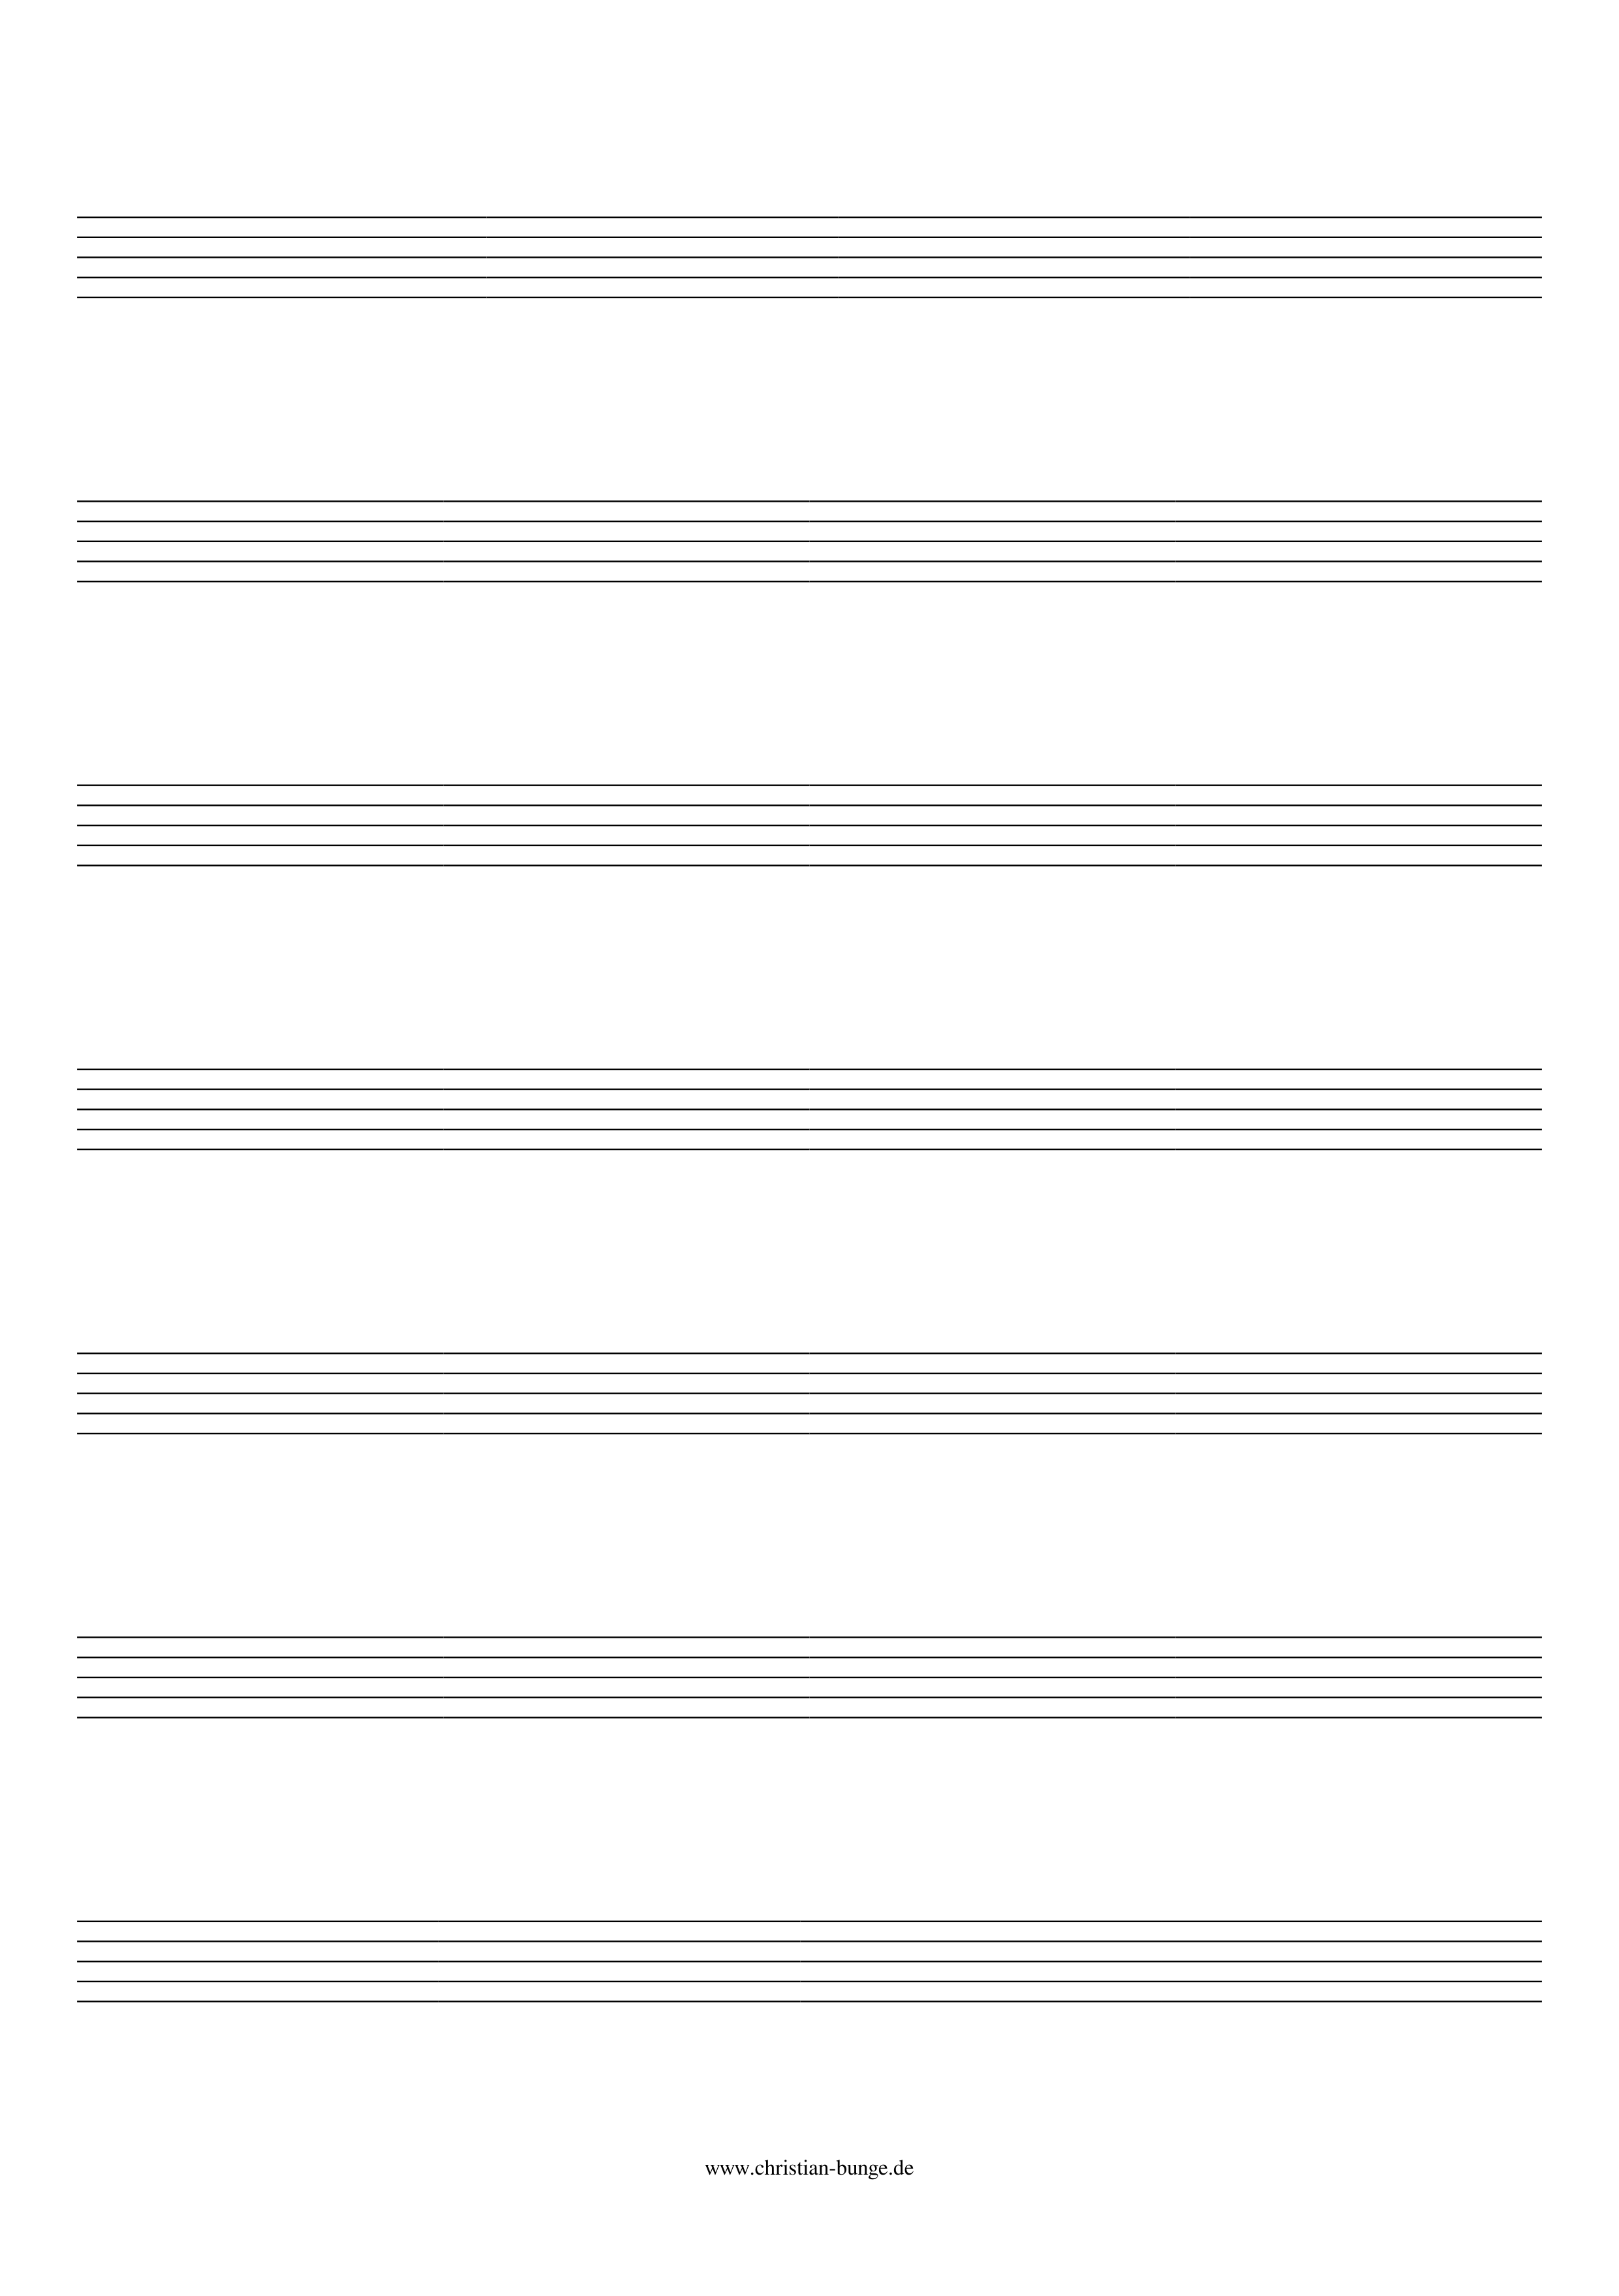 griffdiagramm gitarre blanko